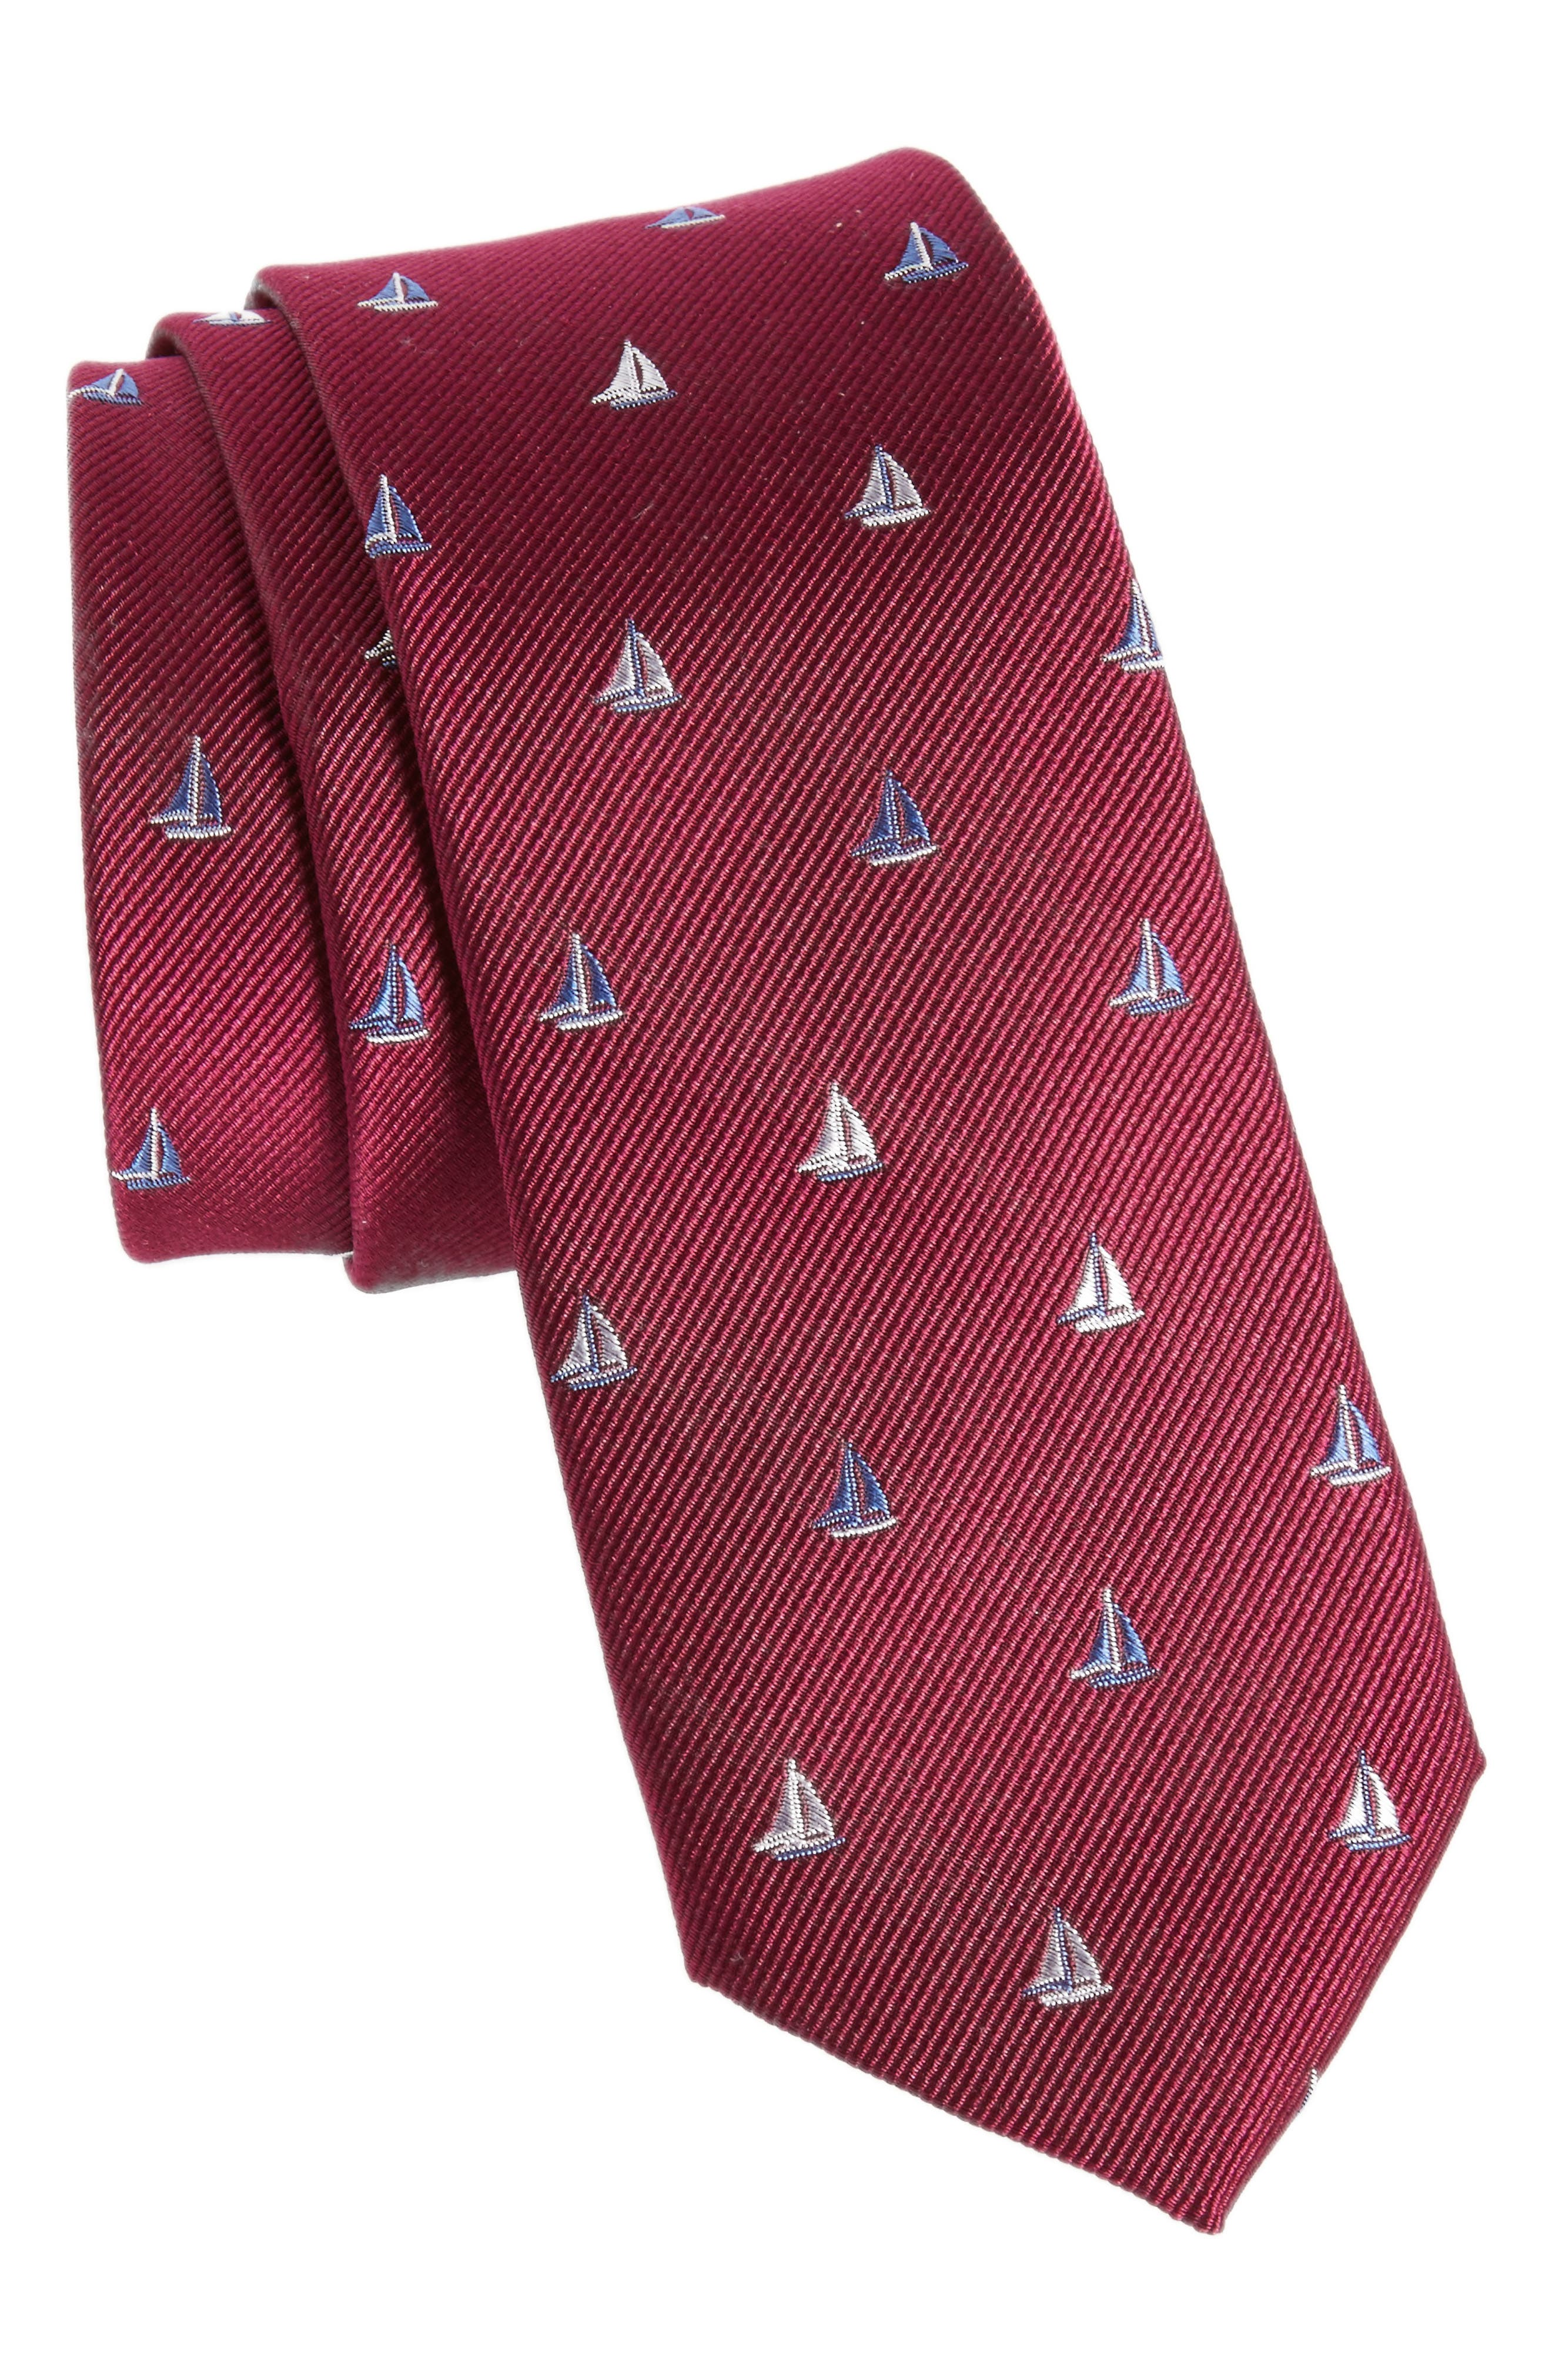 Alternate Image 1 Selected - Nordstrom Men's Shop Sailboat Silk Skinny Tie